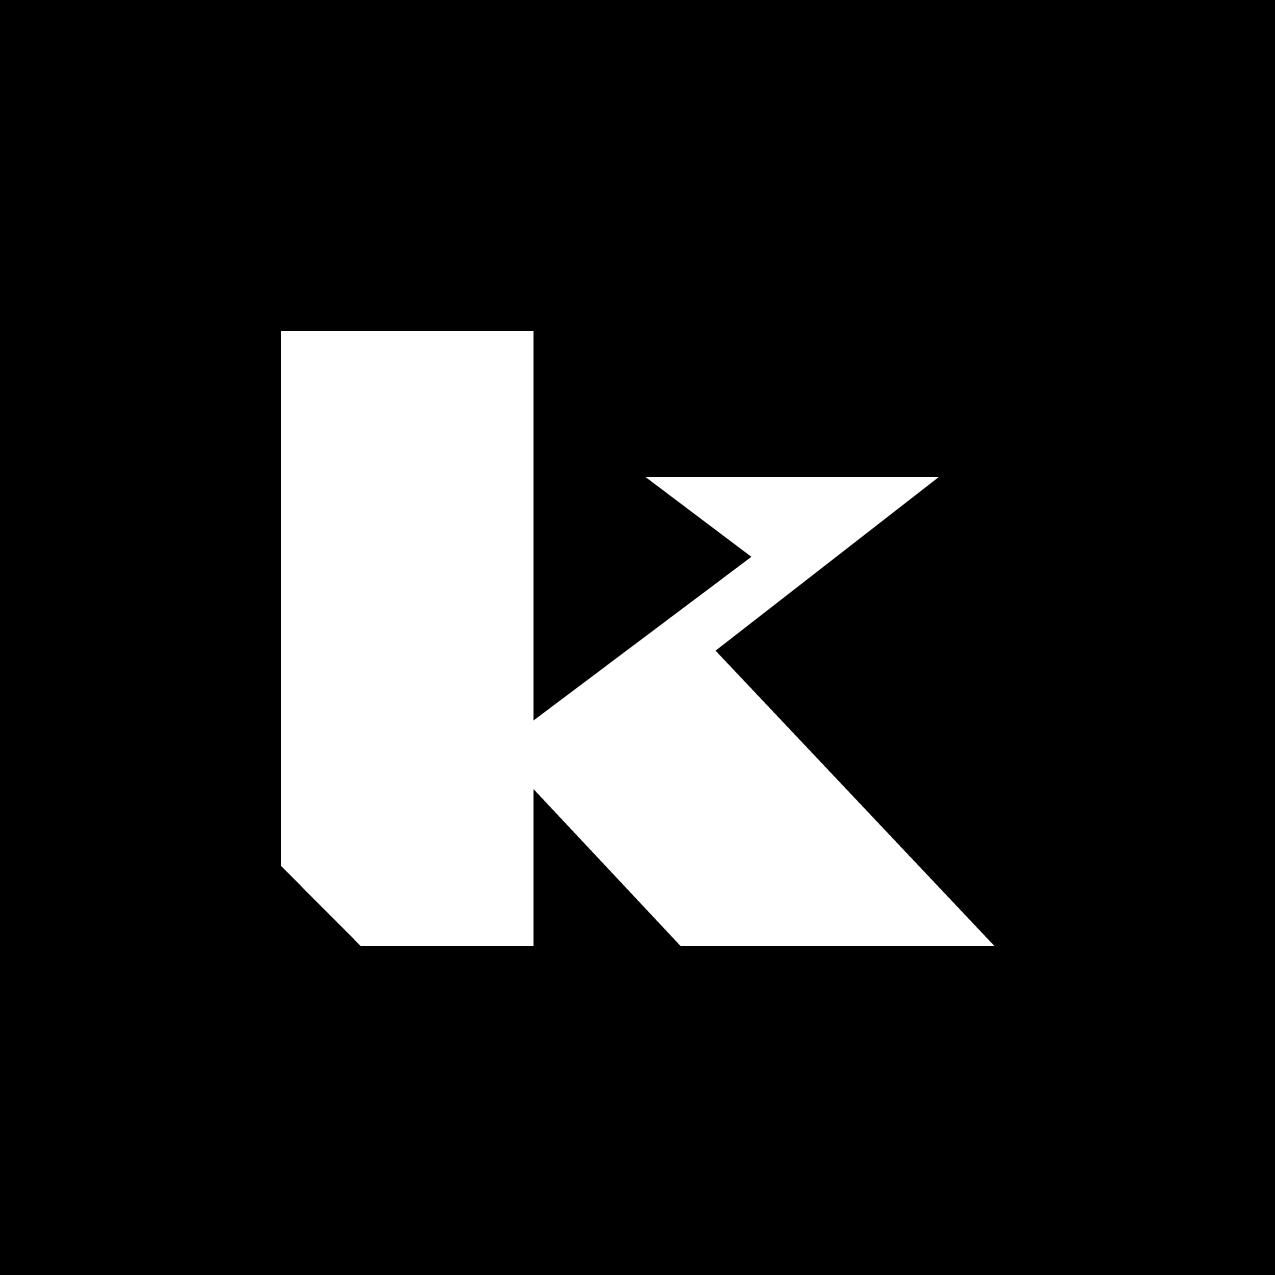 Letter K10 Design by Furia